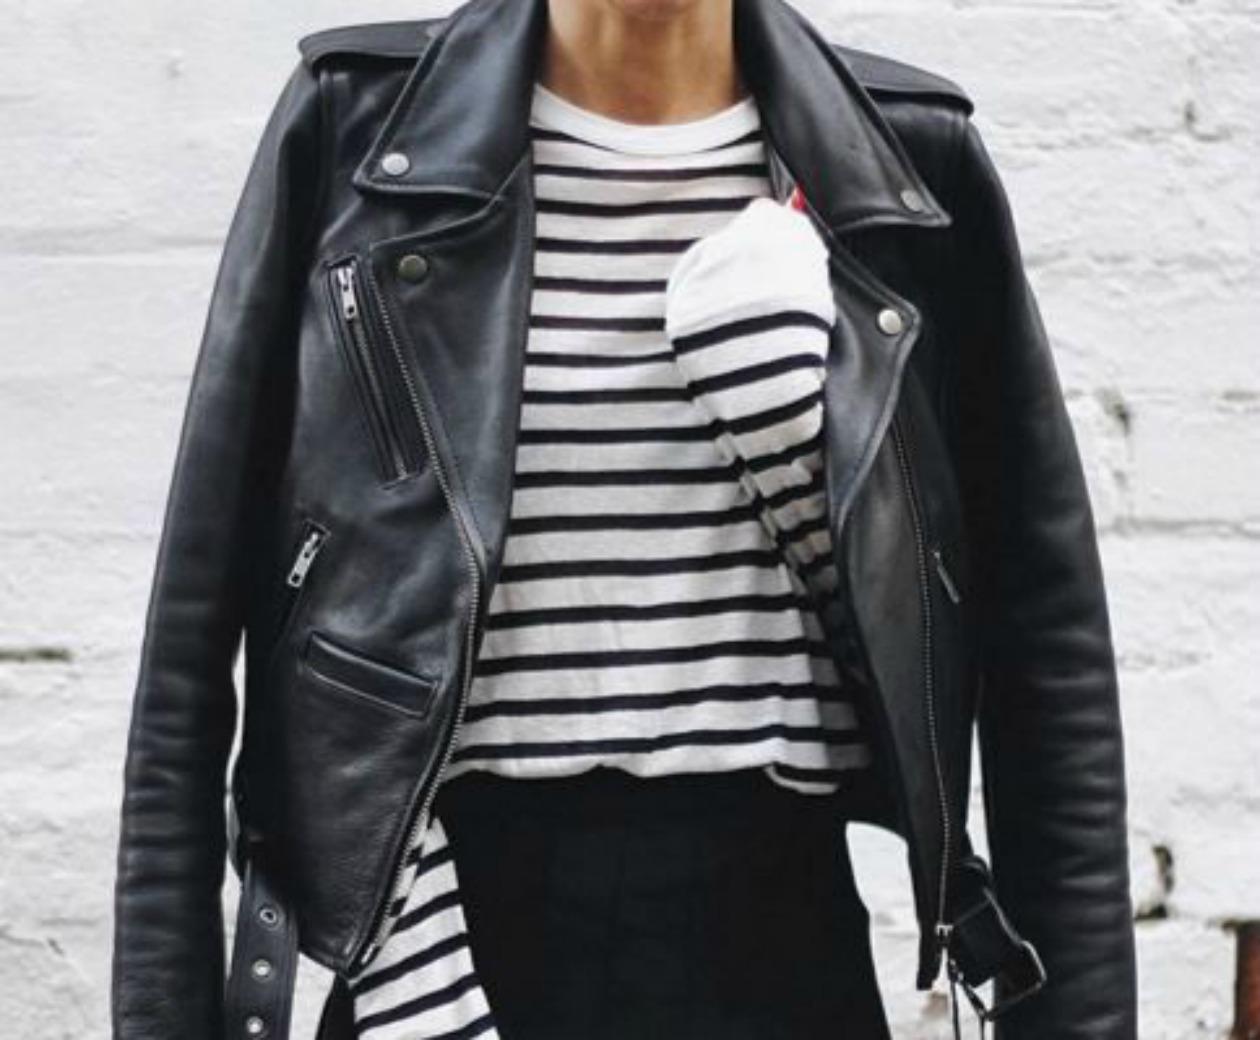 5e5abb143d9 Leather girl! 9 δερμάτινα μπουφάν που θα κάνουν θραύση   womanoclock.gr